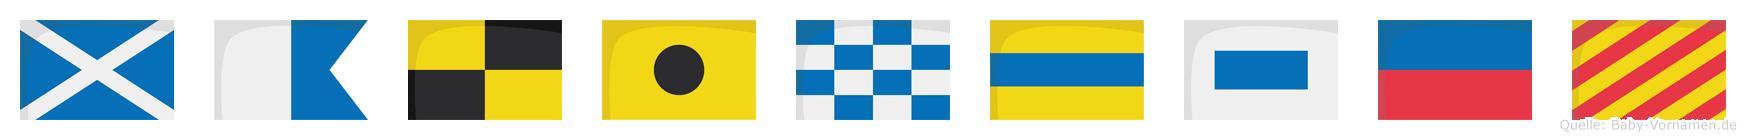 Malindsey im Flaggenalphabet